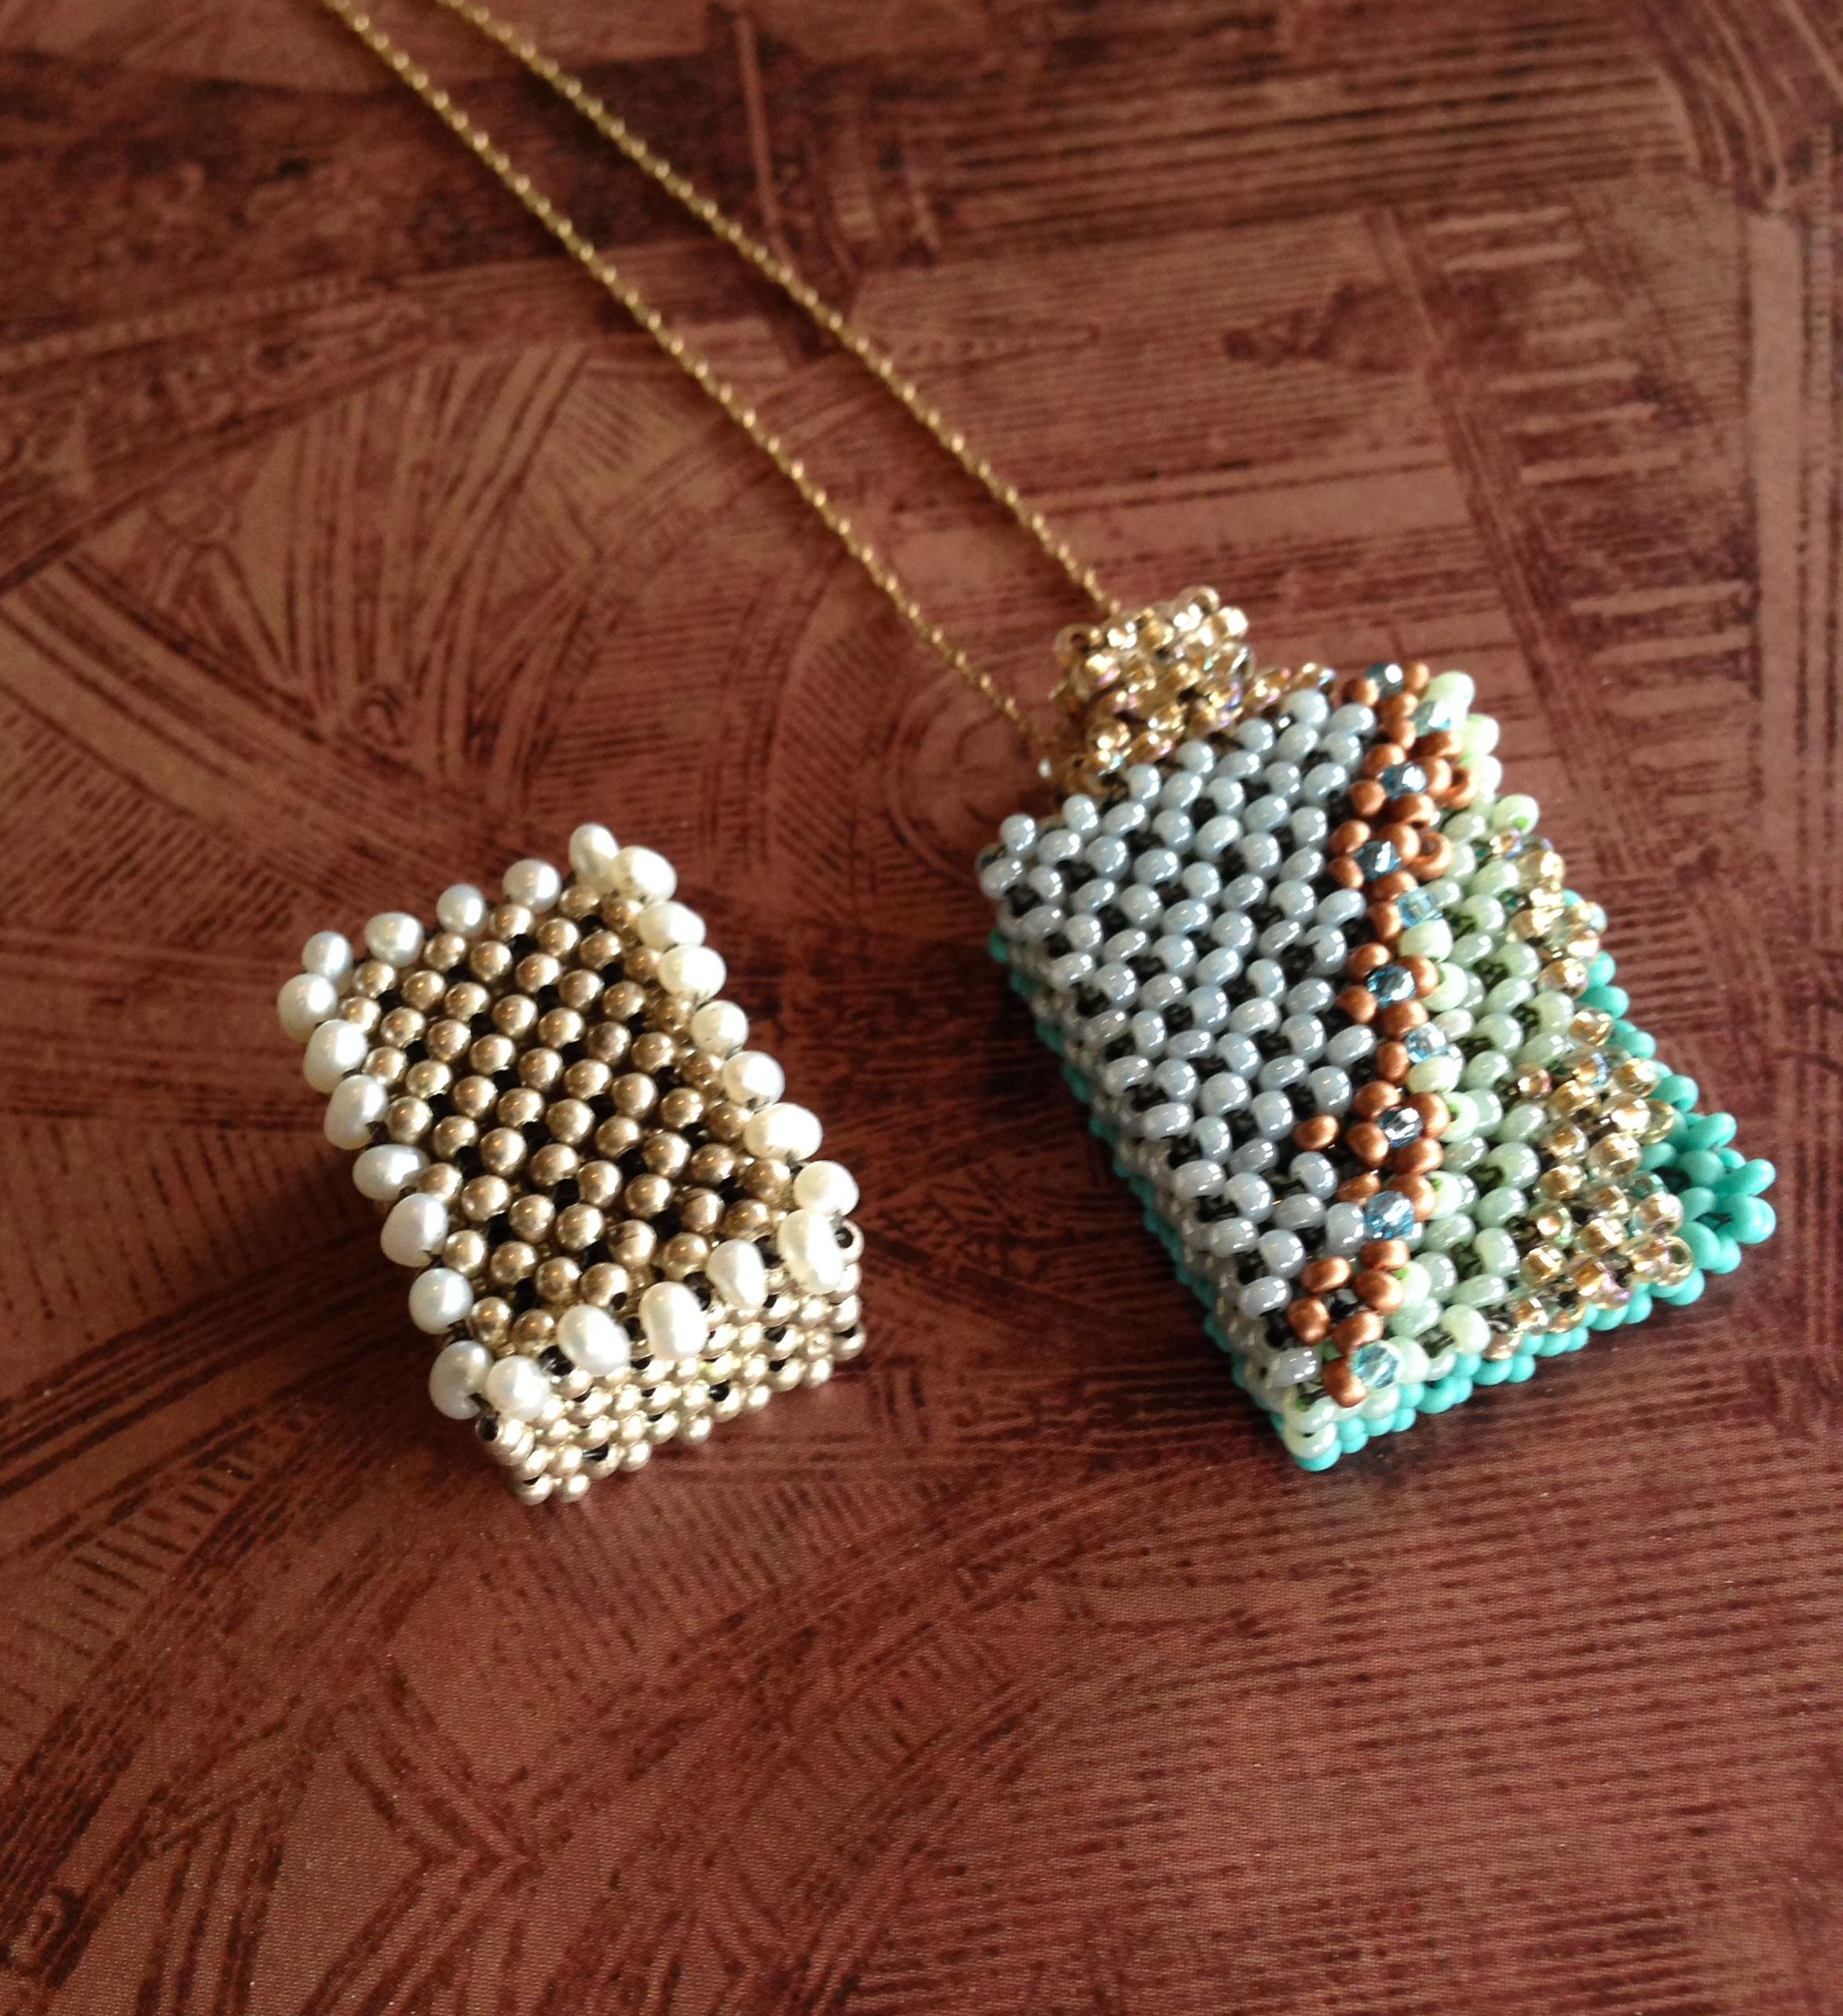 jewelry gallery reno bead shop